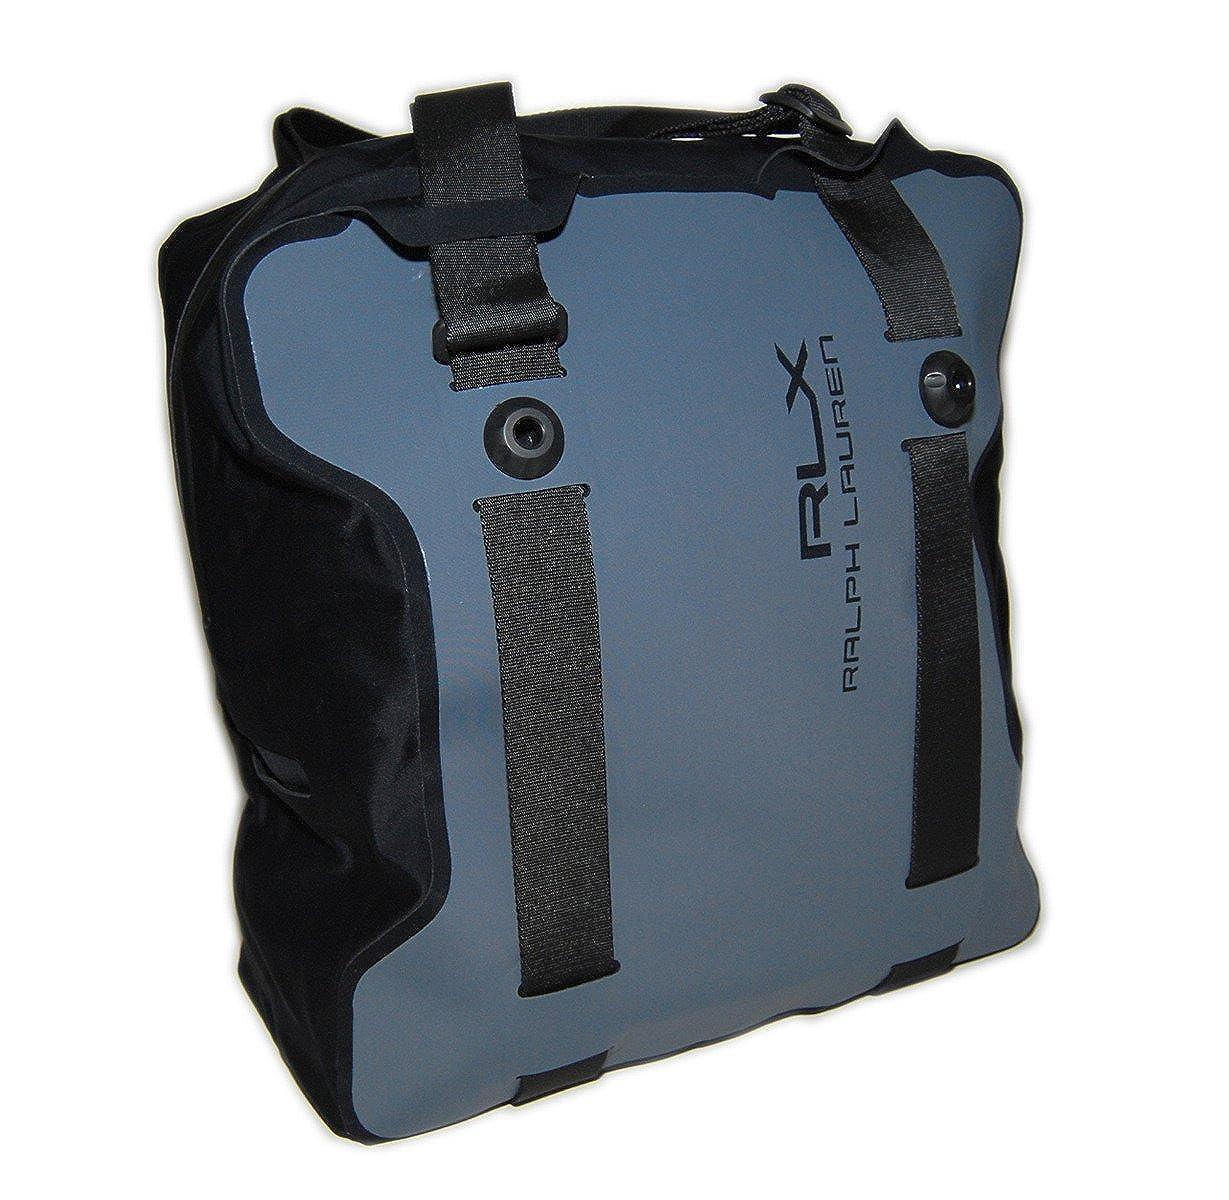 a18182f7b5 Amazon.com  Ralph Lauren RLX Waterproof Sport O-Range Solar Tote Bag Grey  Black Italy  Clothing